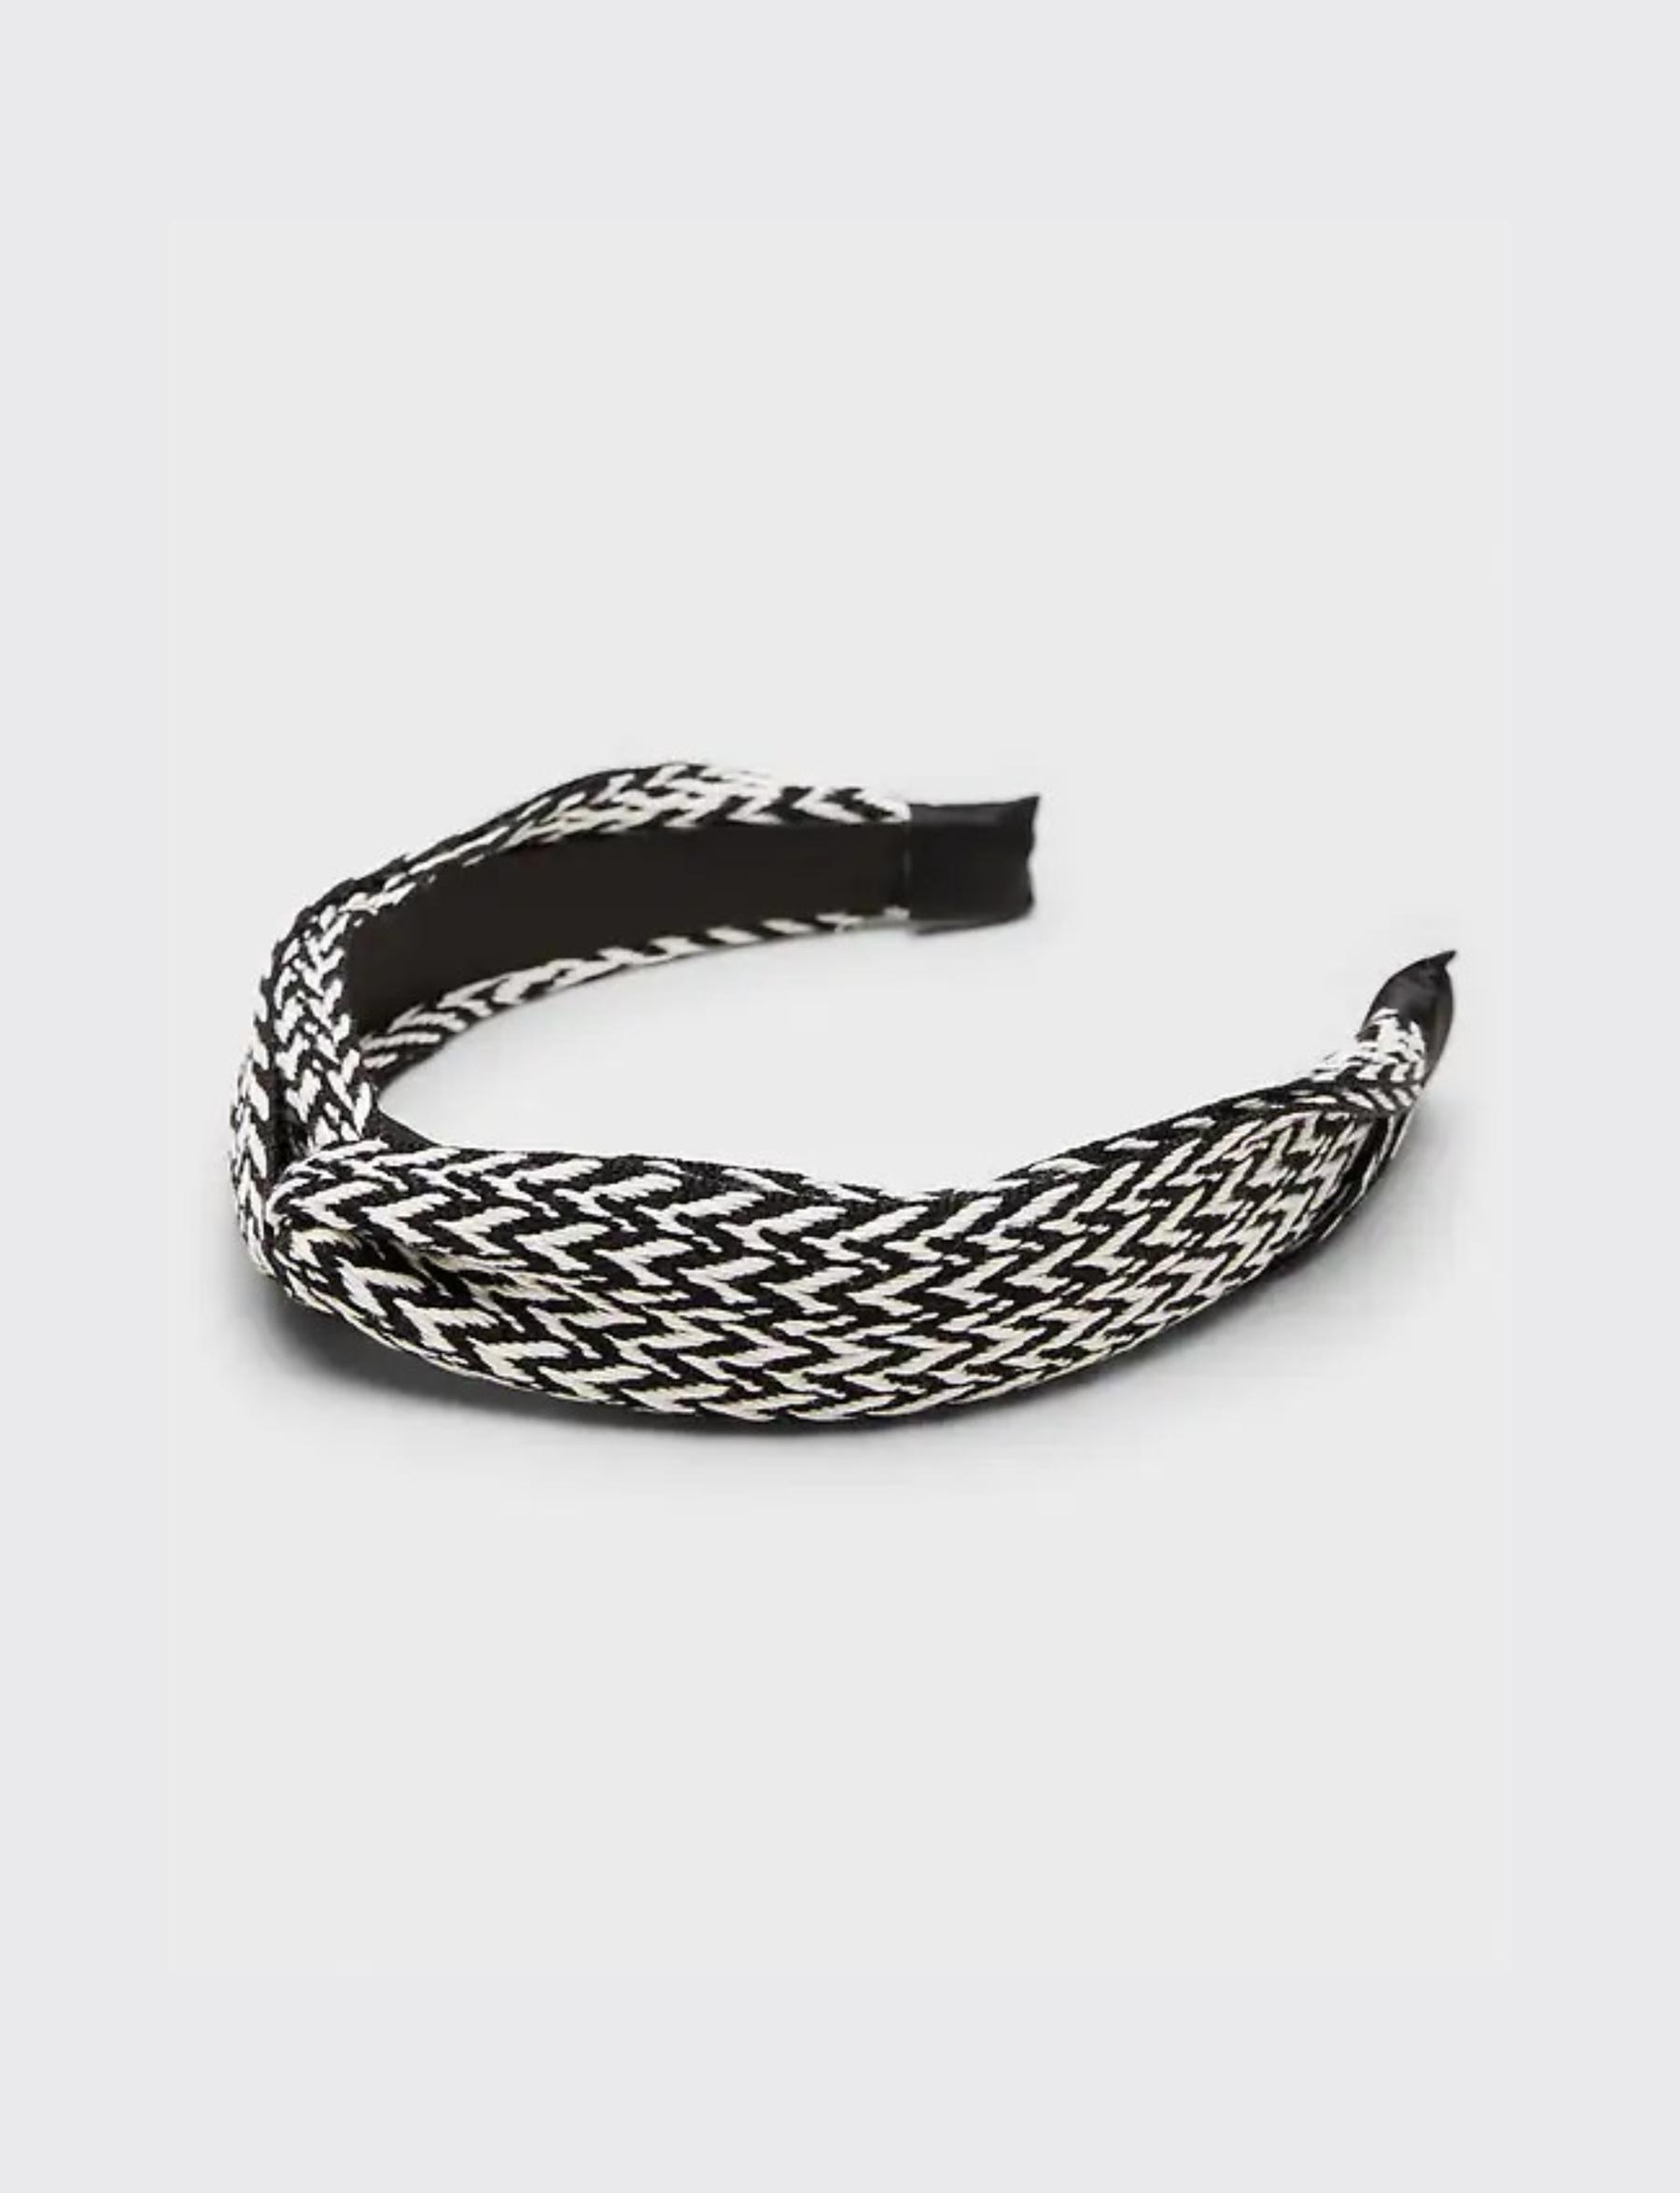 Woven Chevron Headband